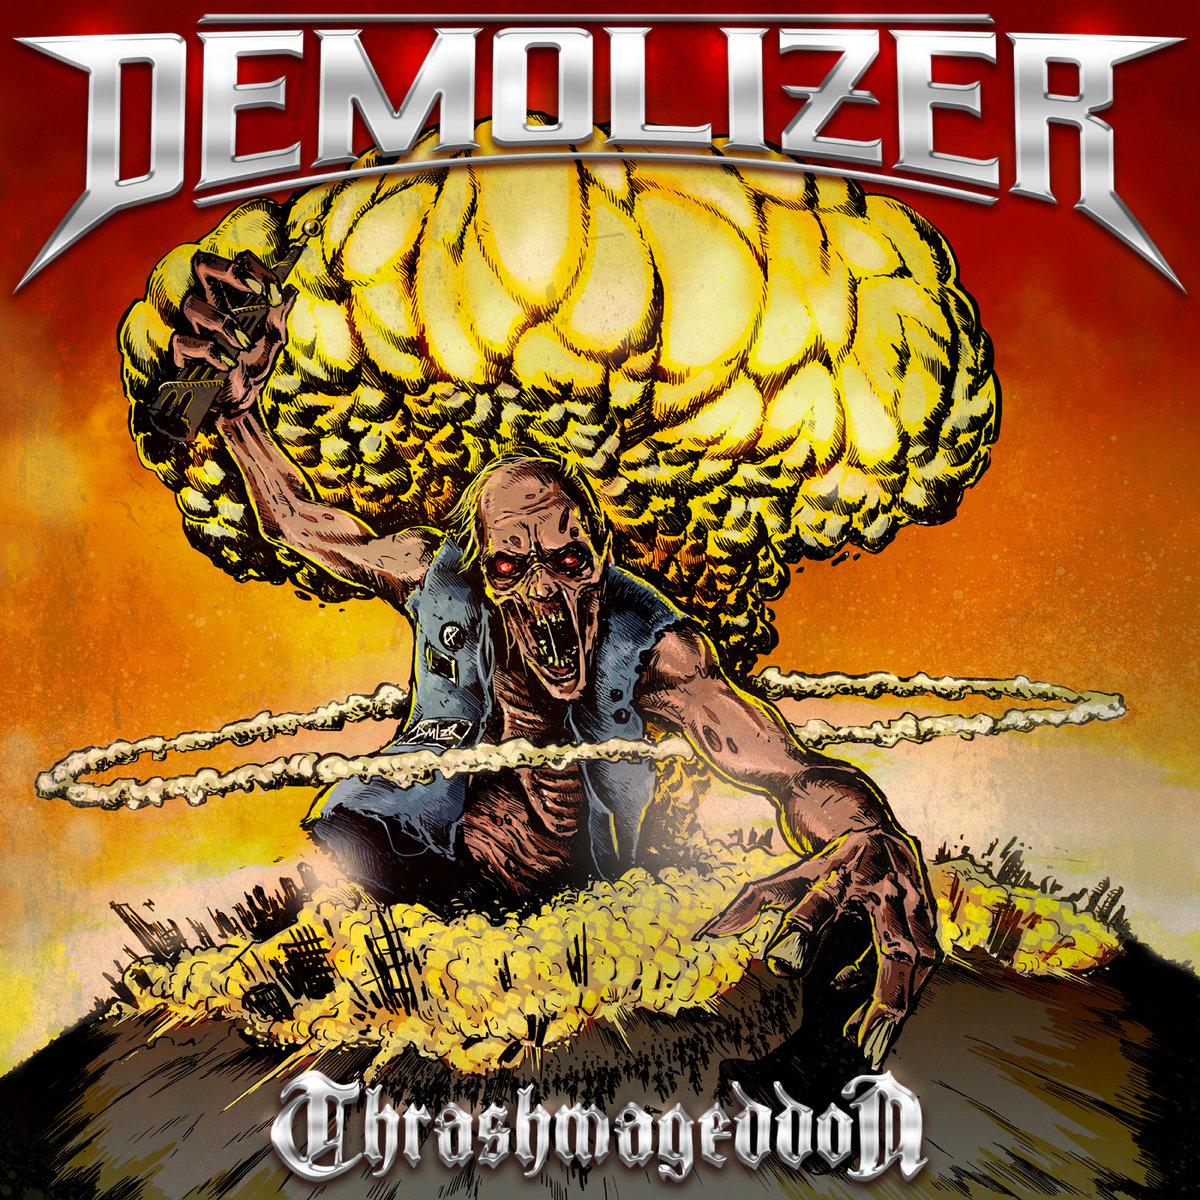 Thrashmageddon | Demolizer | Target Group